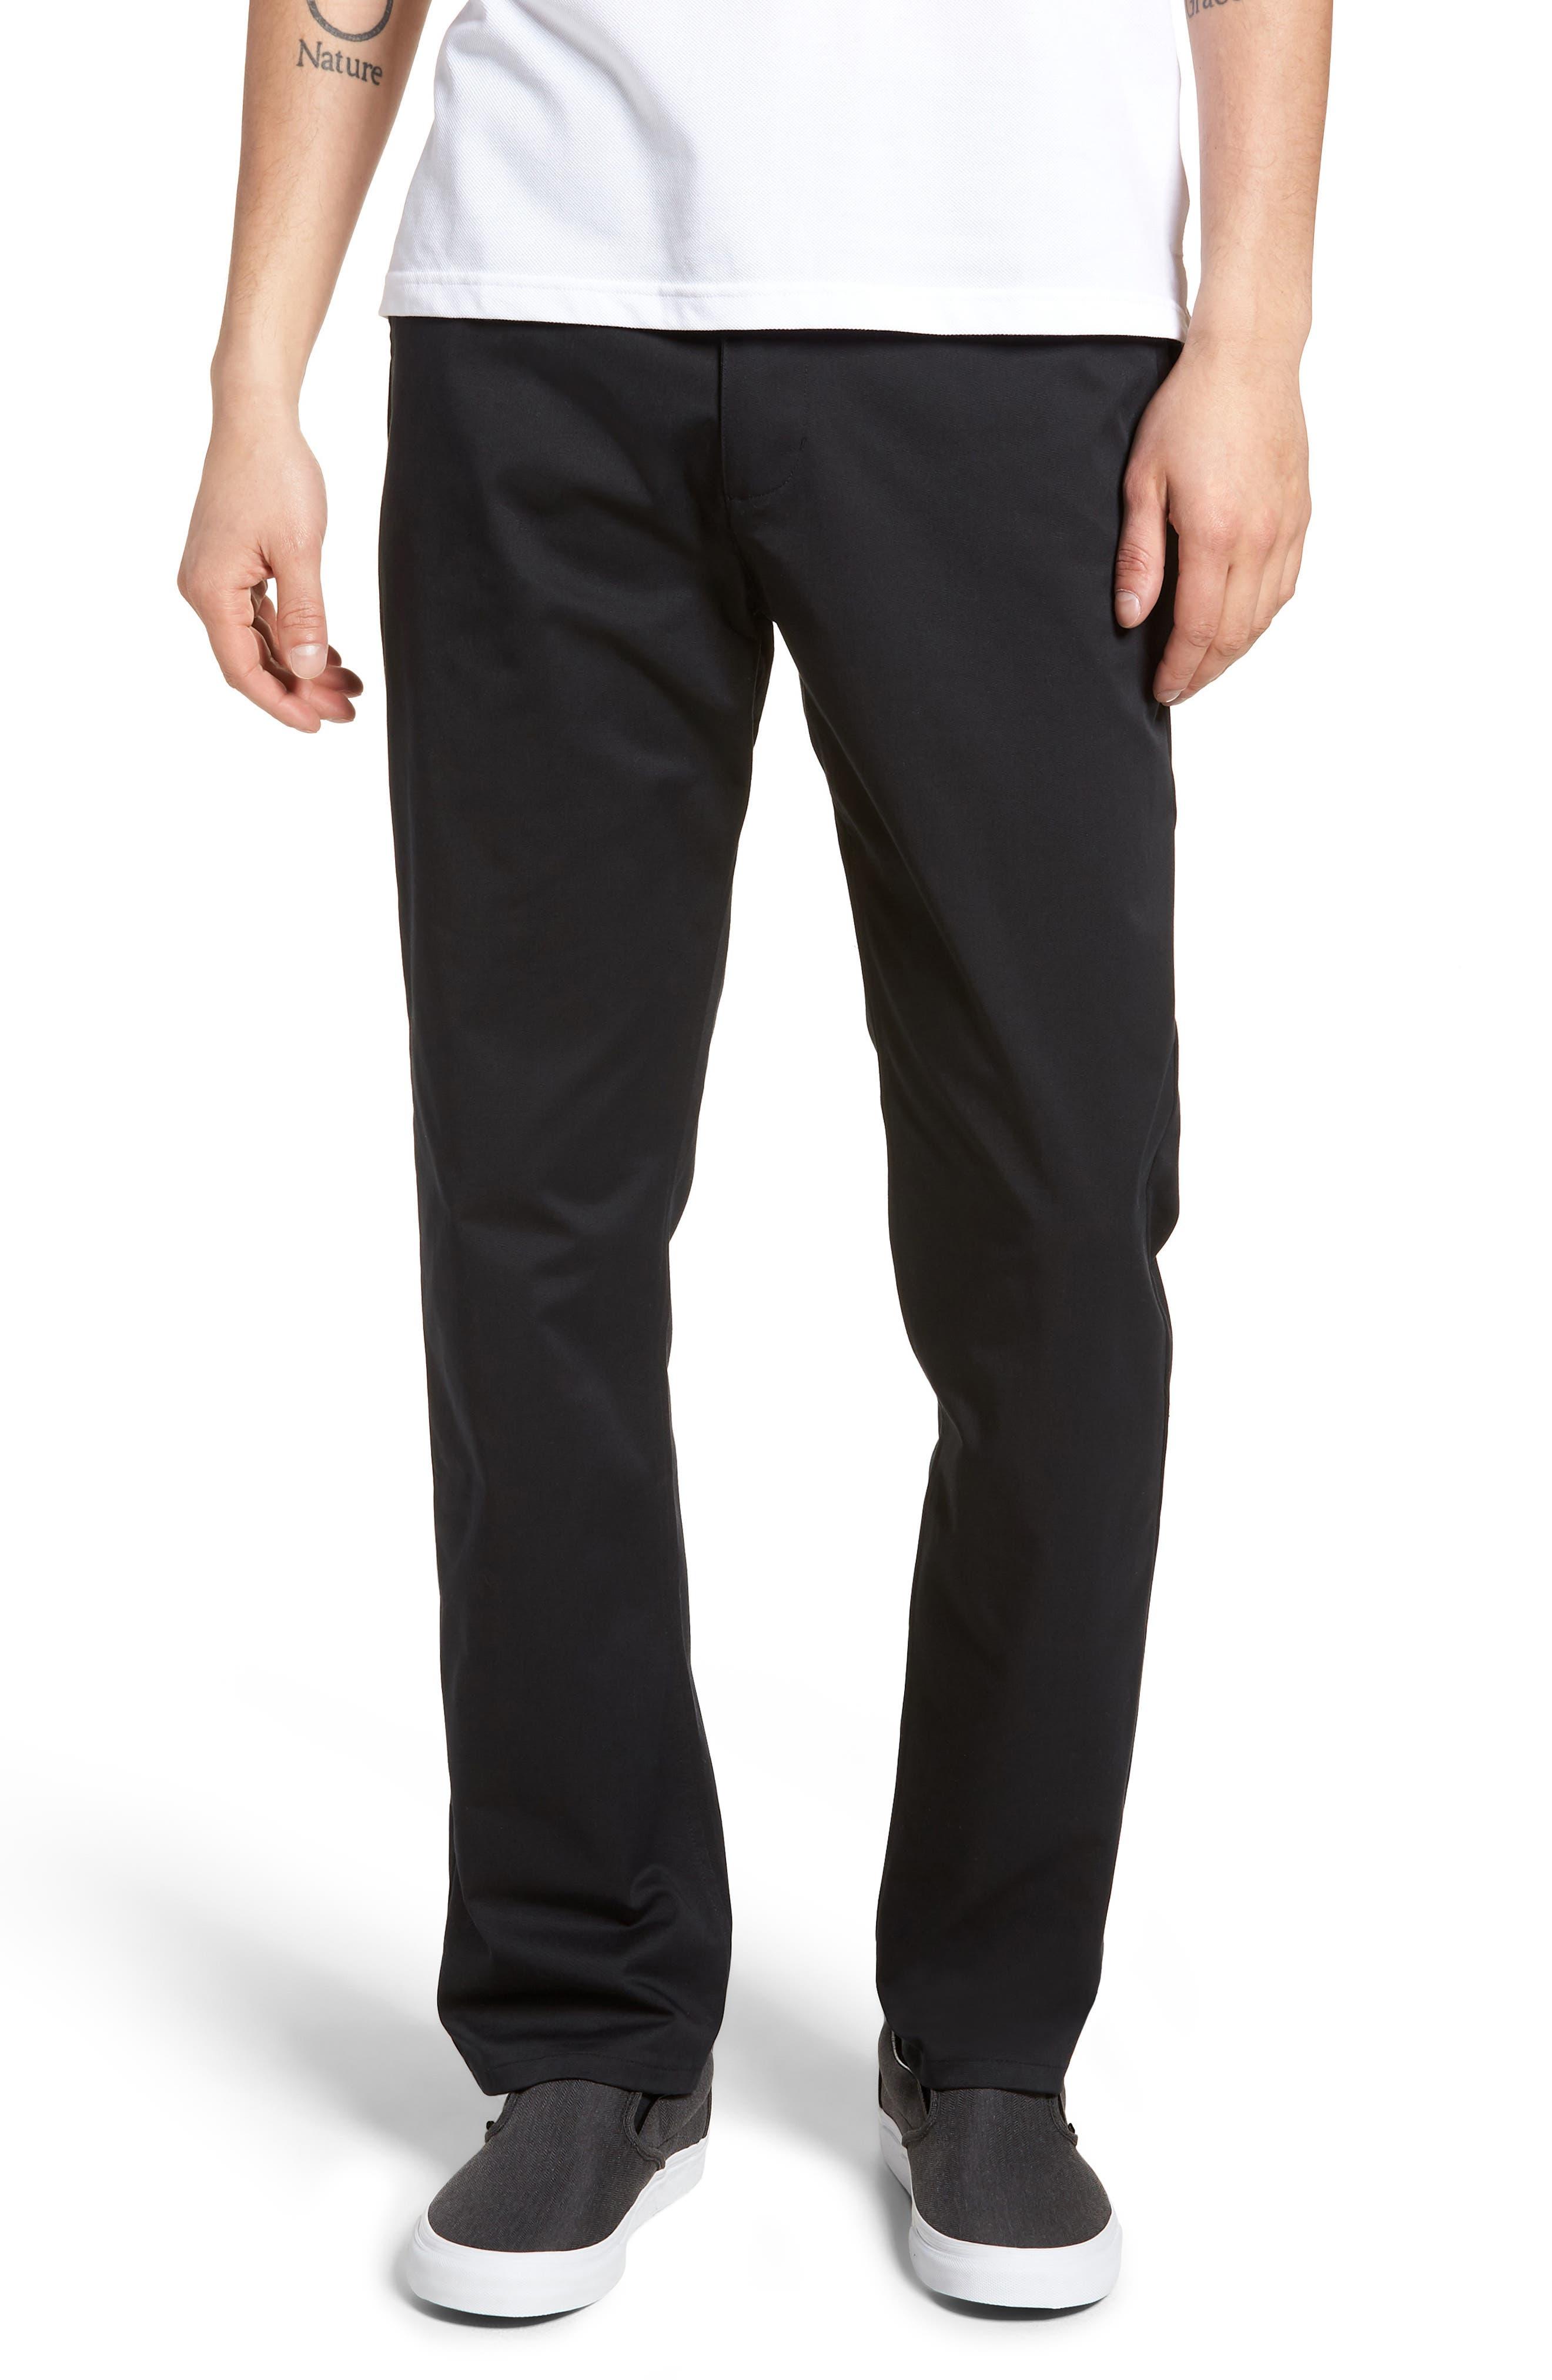 Chinos Nike Pants Sb amp; Nordstrom Men's Khaki 6RqCww